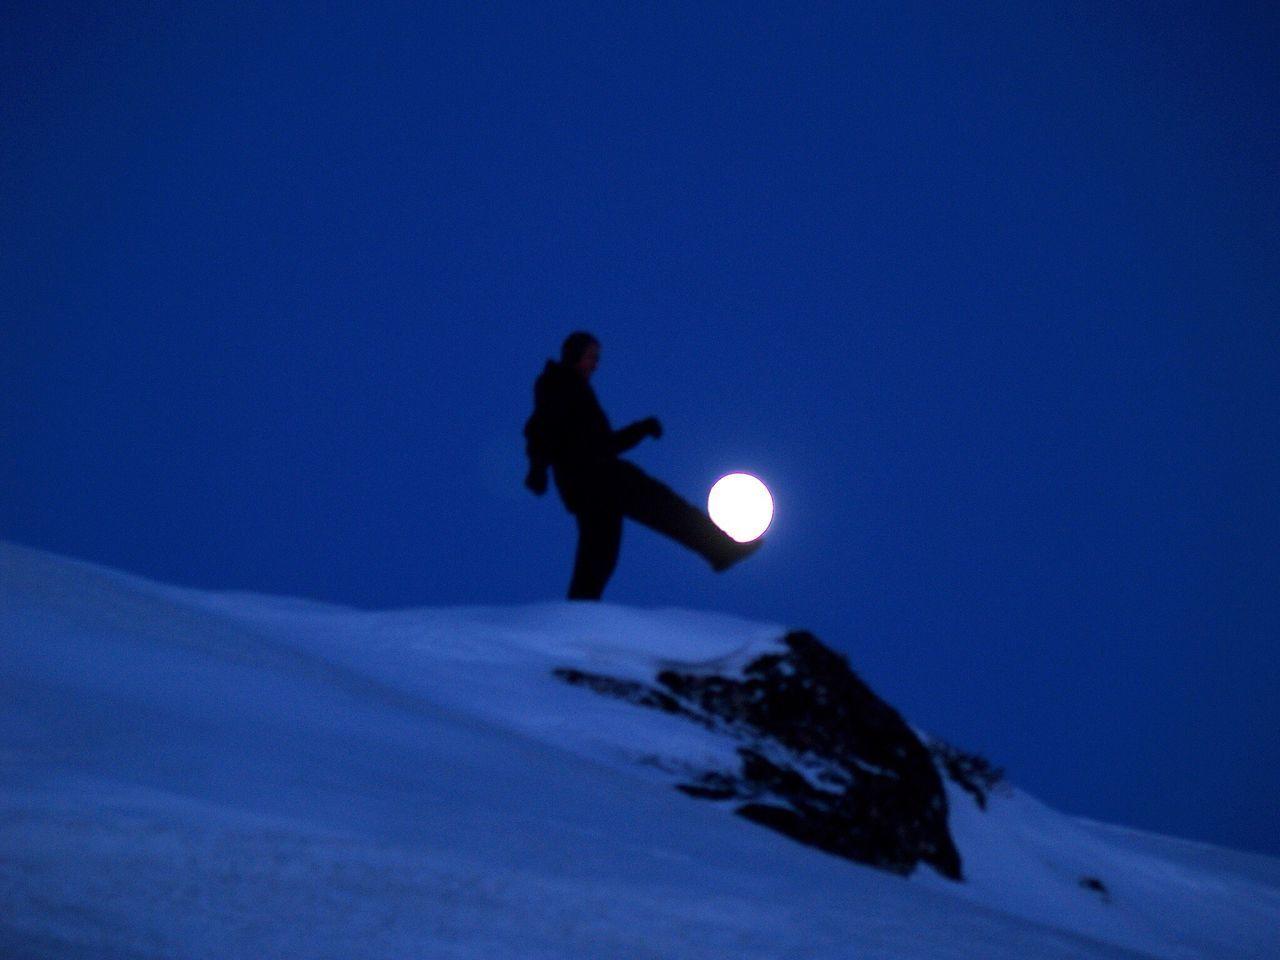 Optical Illusion Of Man Kicking Full Moon Clear Sky At Dusk